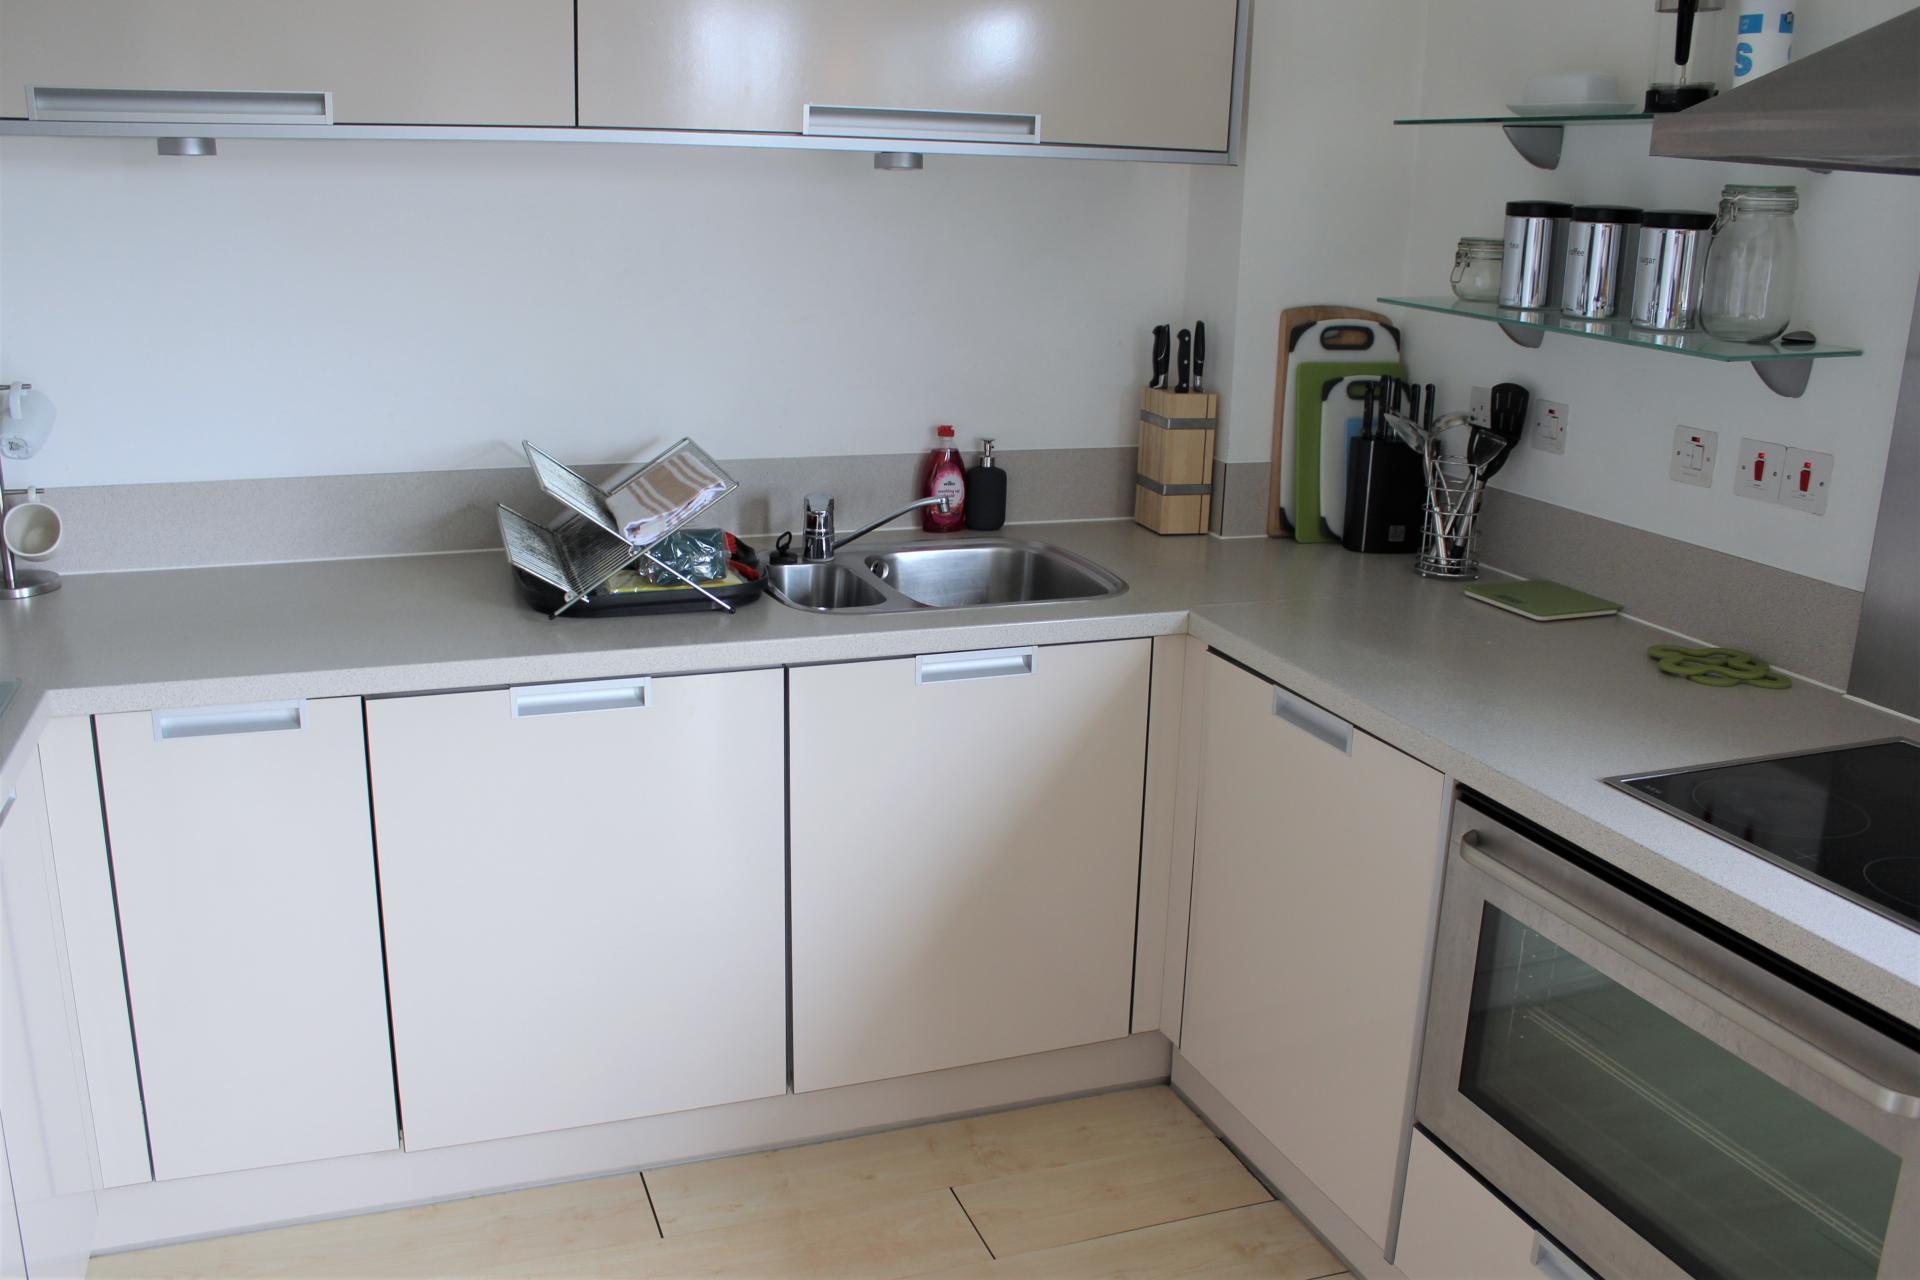 Kitchen worktops at Ocean Village Serviced Apartments - Citybase Apartments